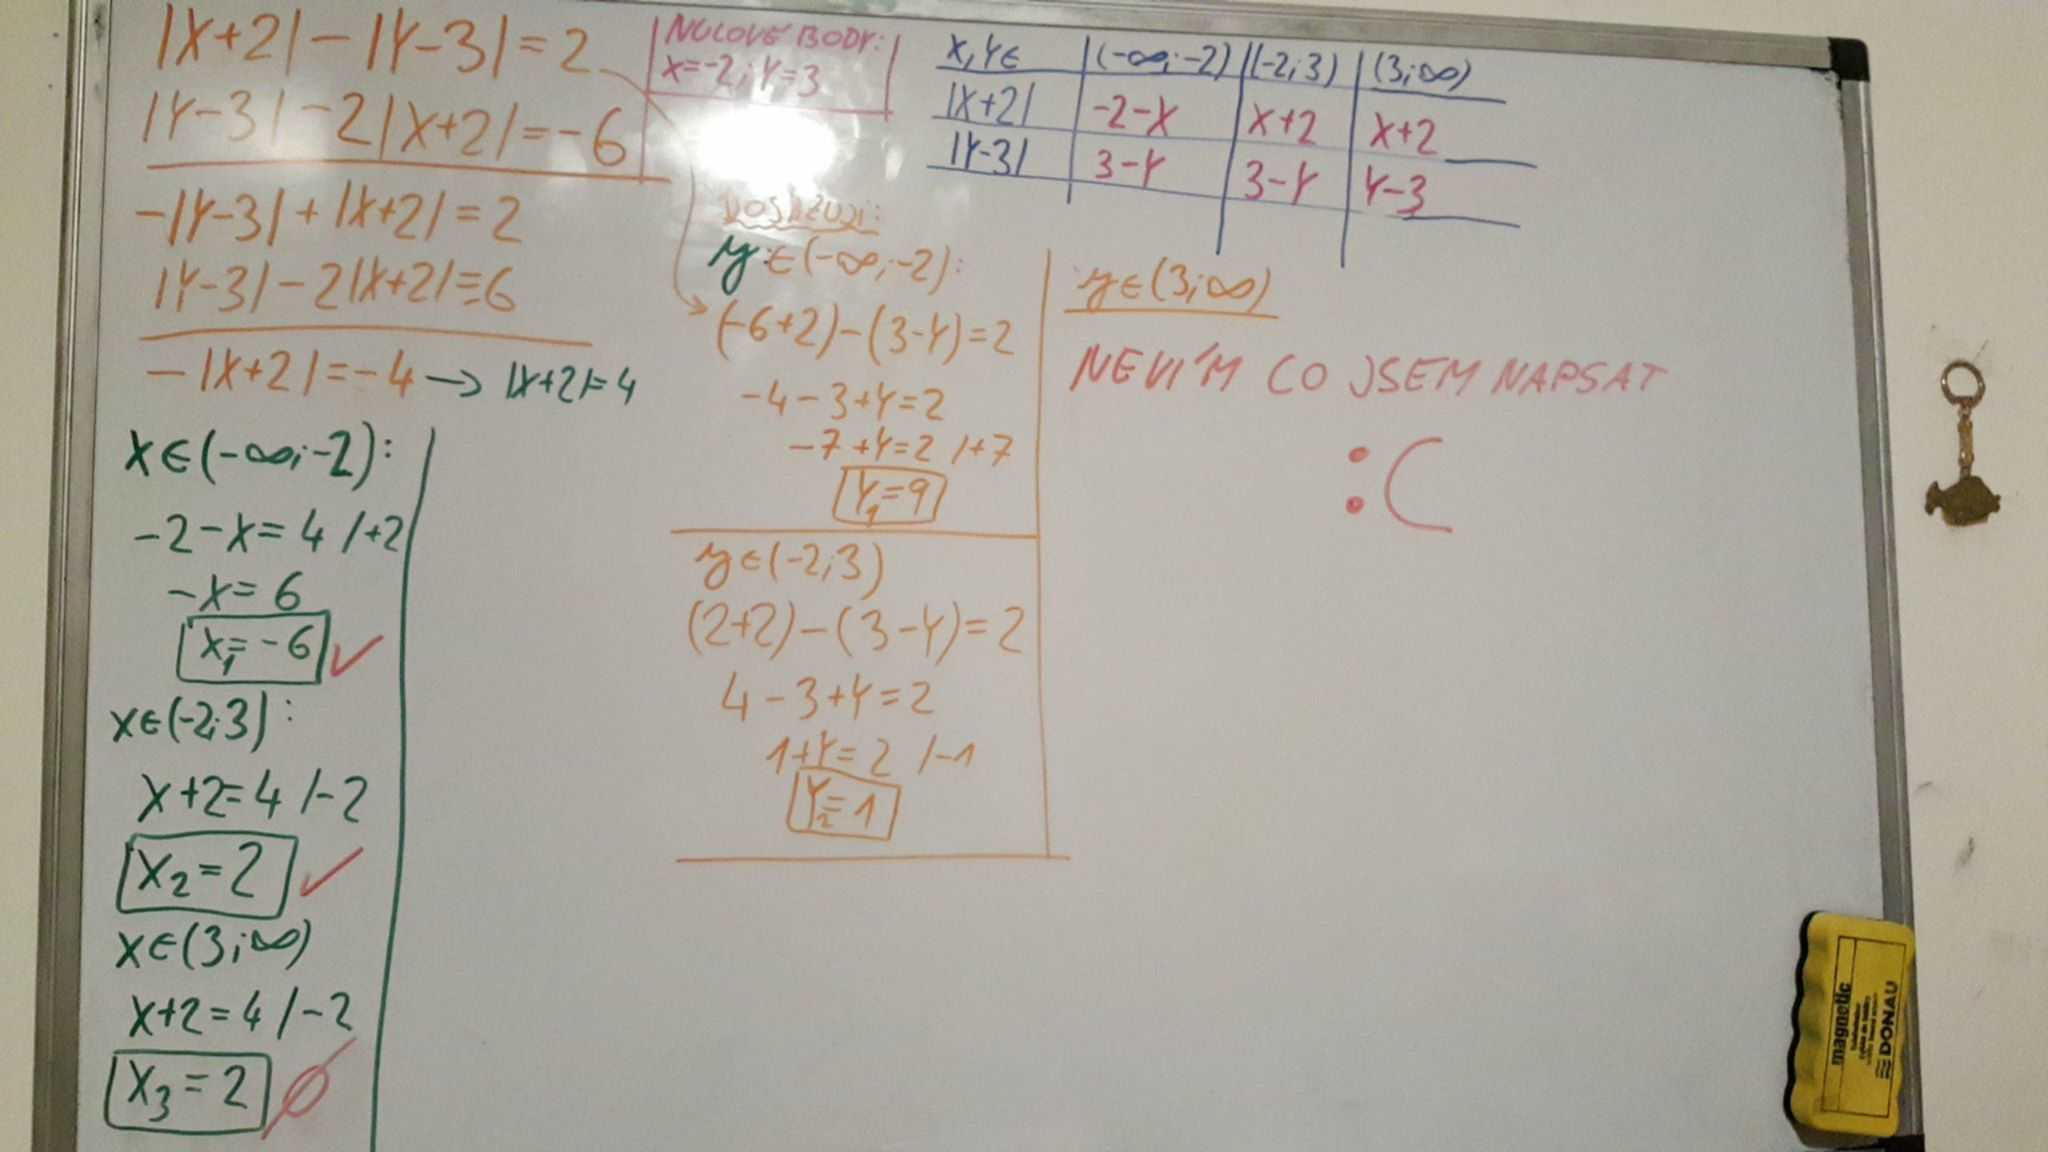 http://forum.matematika.cz/upload3/img/2018-02/56395_tabulle.jpg